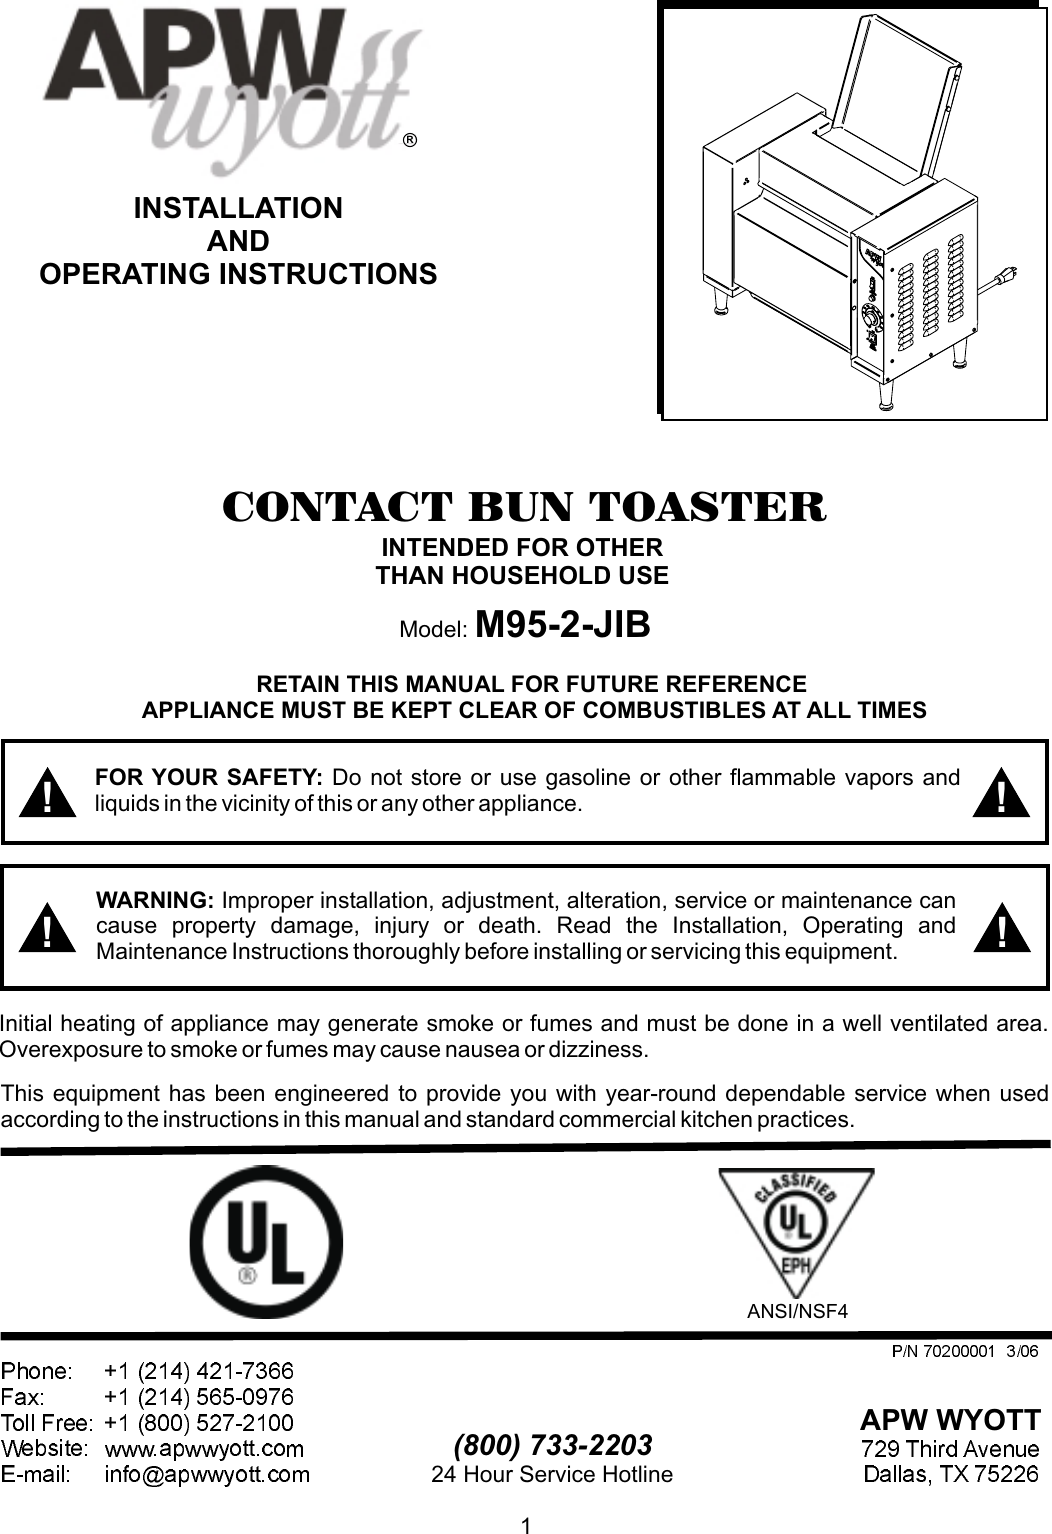 [NRIO_4796]   Apw Wyott M95 2 Jib Users Manual | A Wyott M95 Wiring Diagram |  | UserManual.wiki